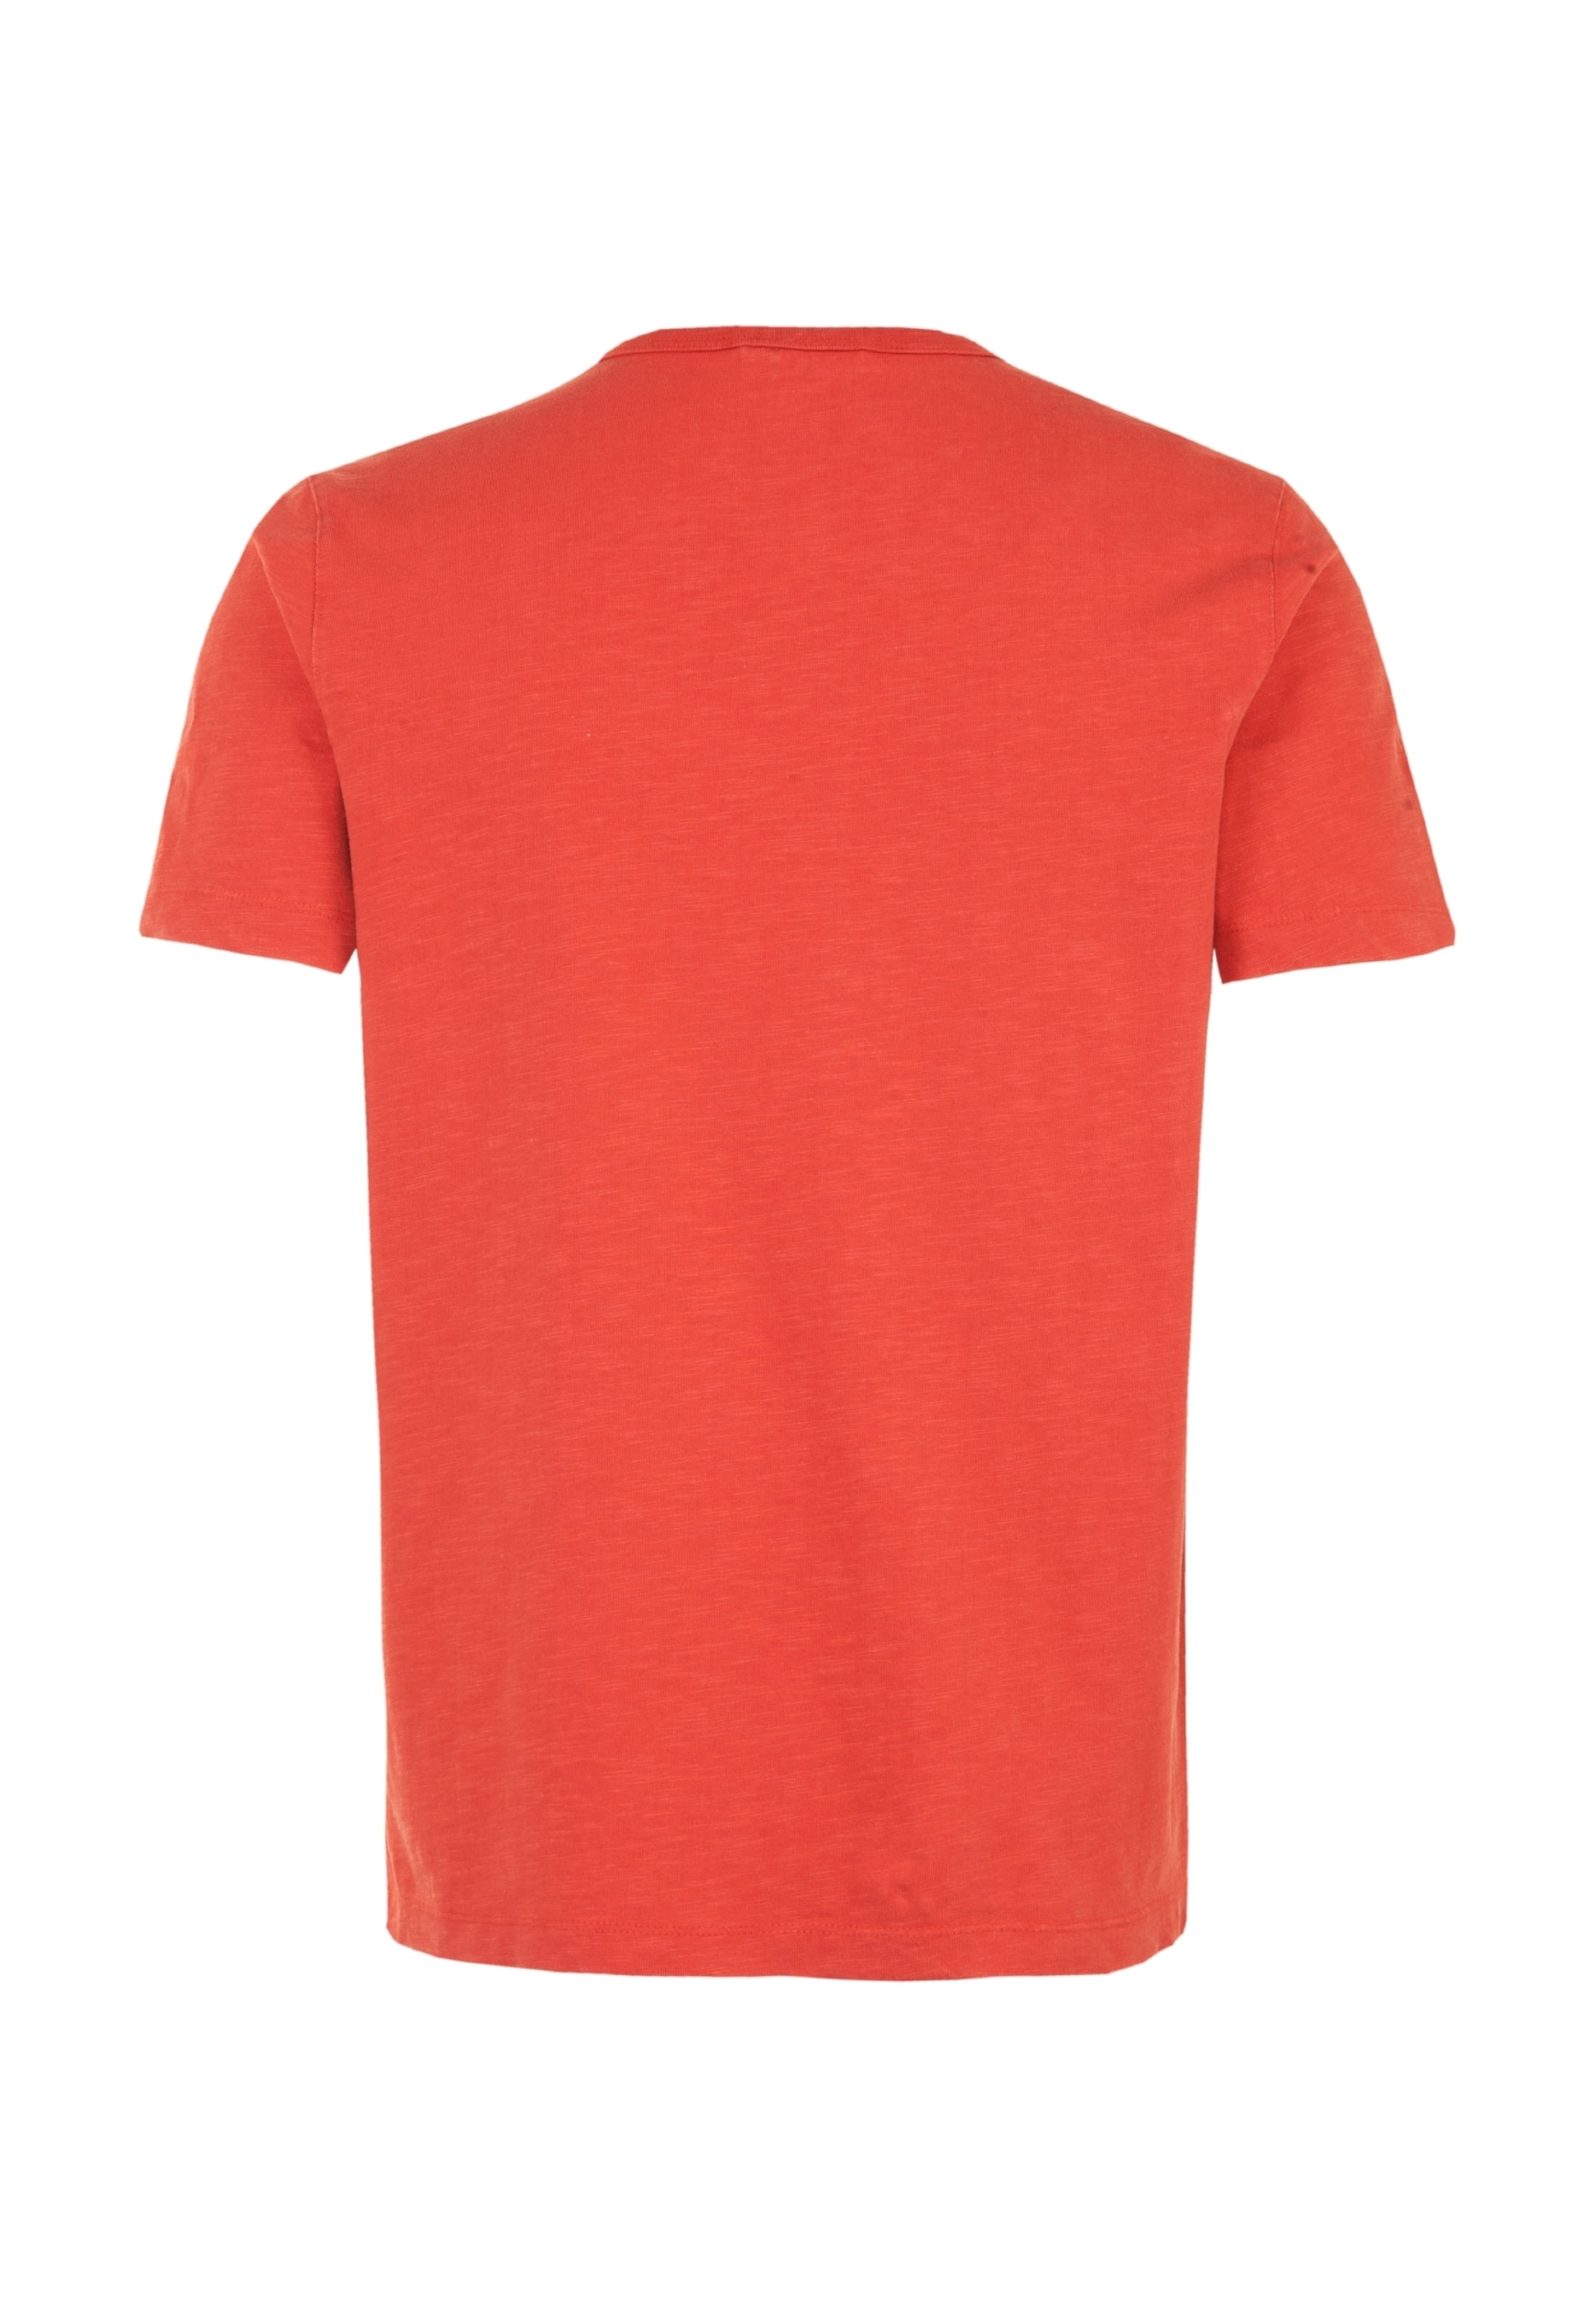 Active Orangerot T In Camel shirt qSVGUjzMpL